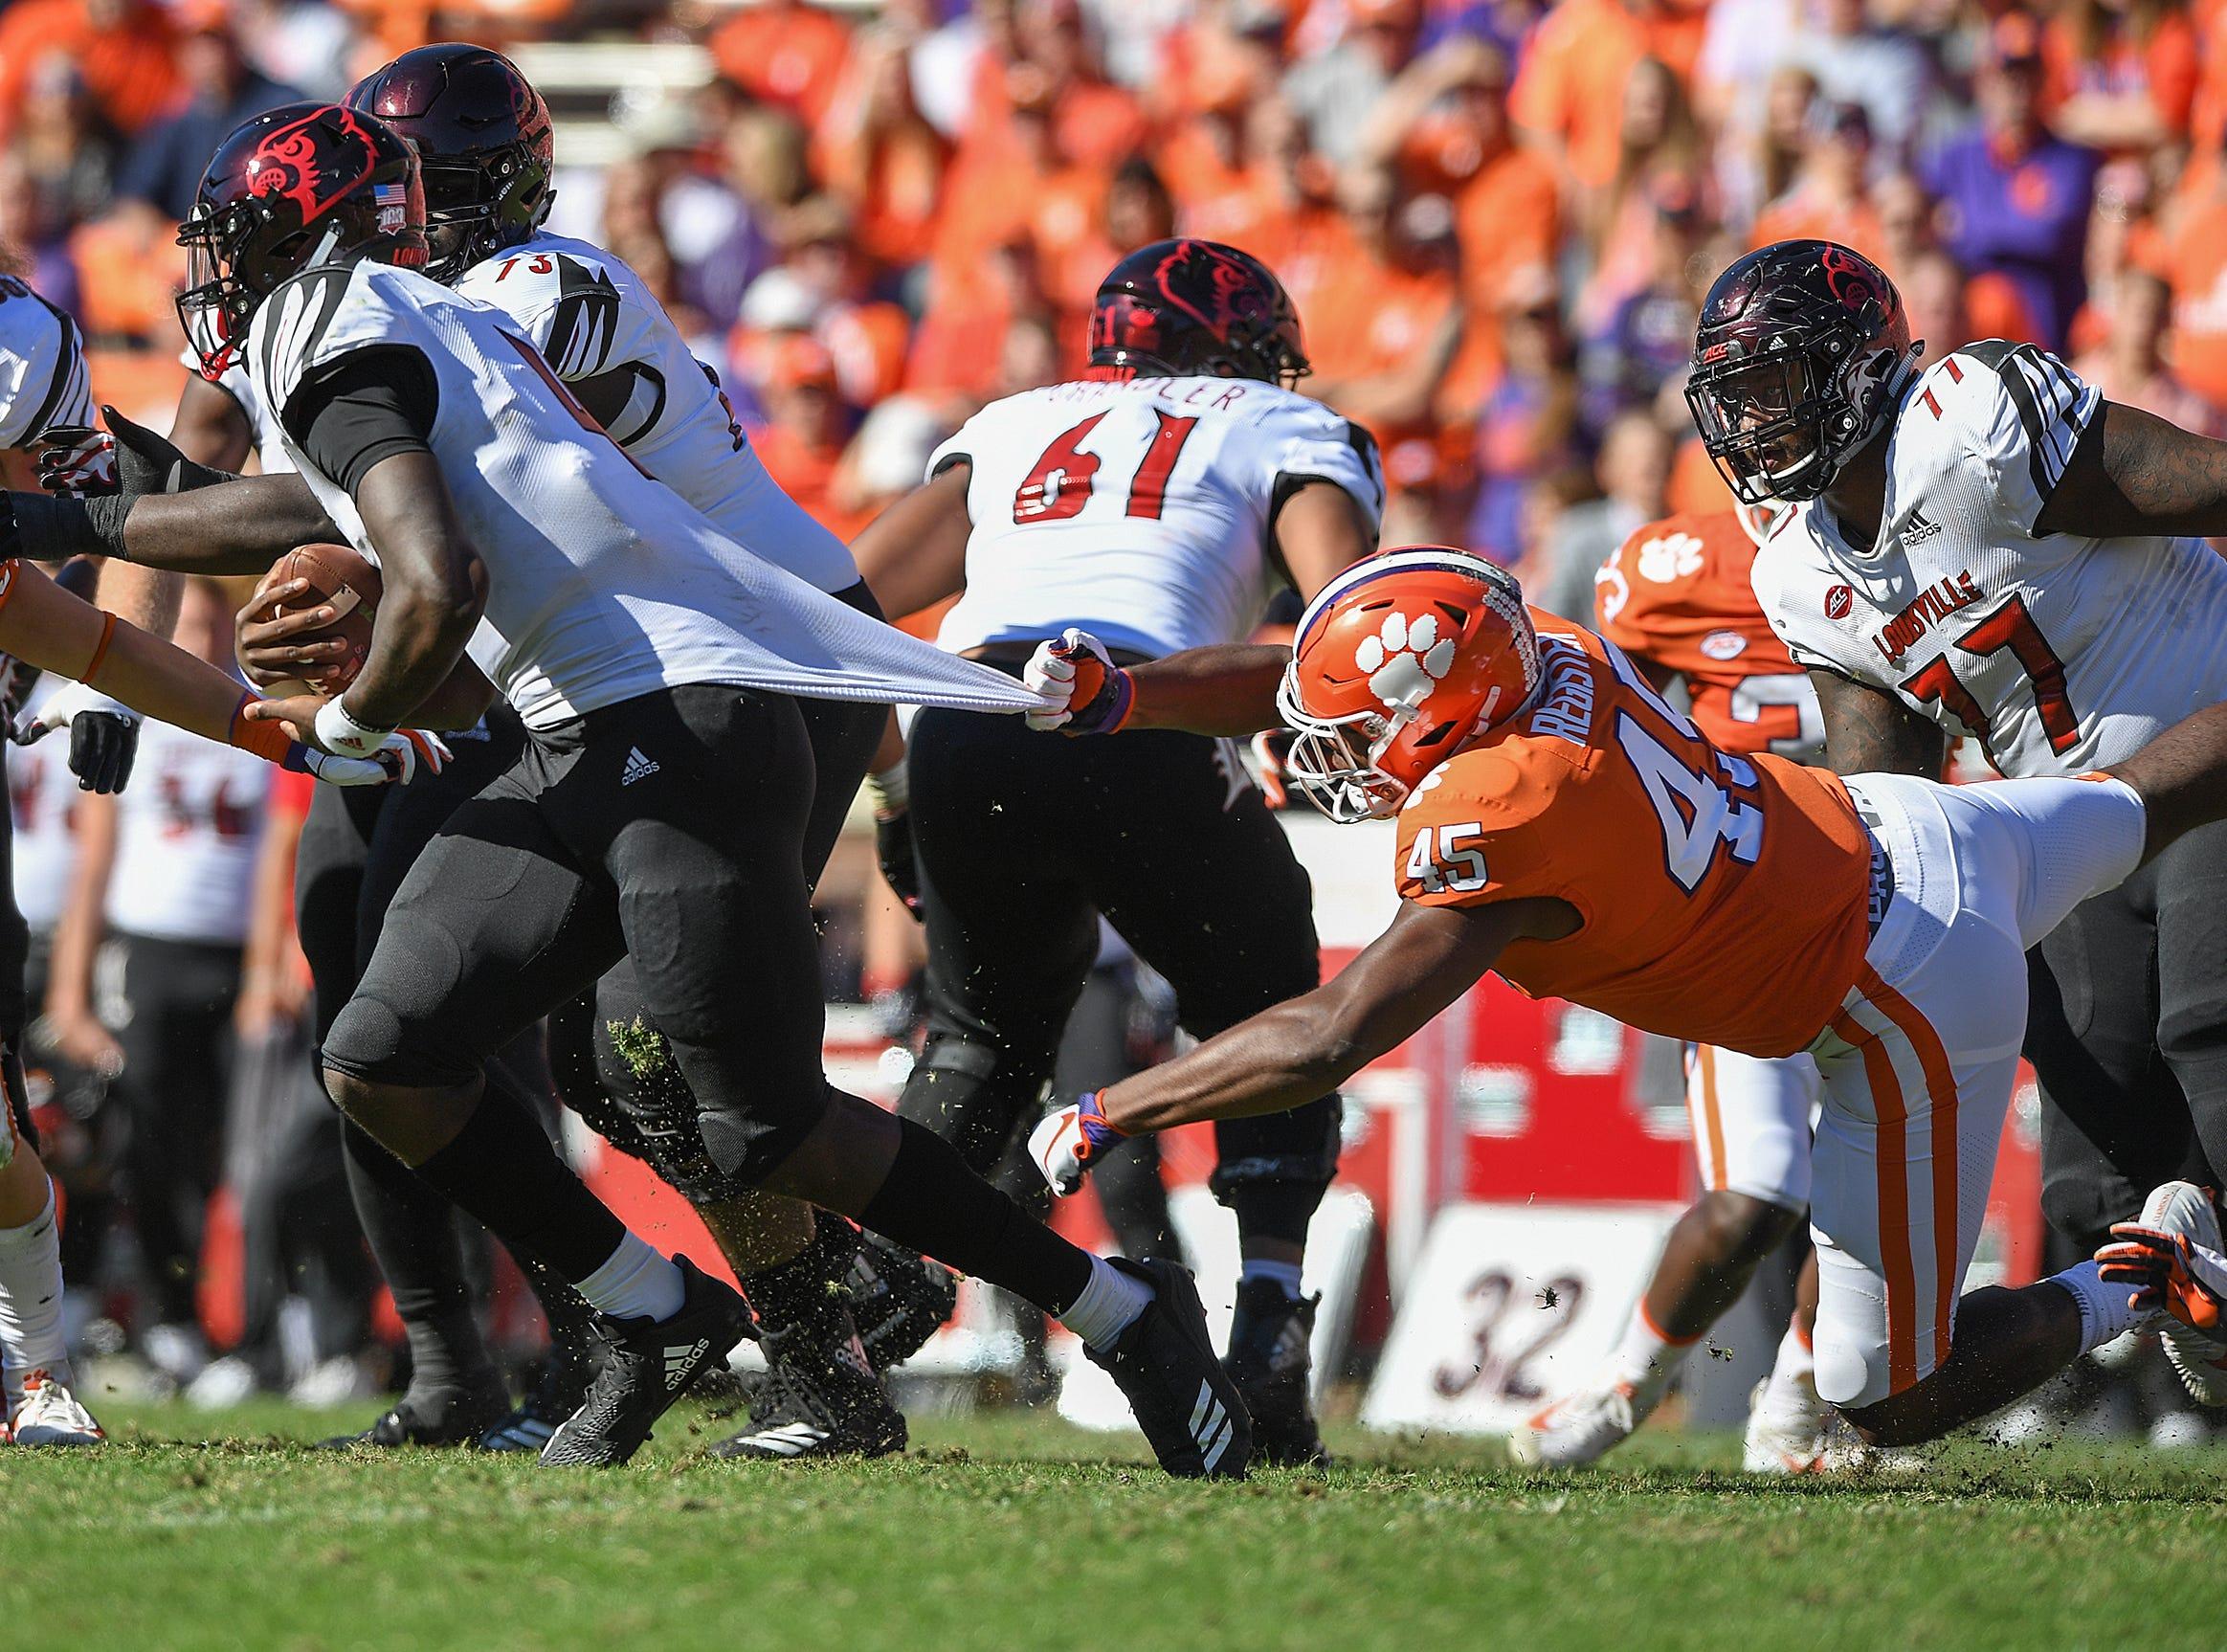 Clemson linebacker Chris Register (45) tries to stop Louisville quarterback Jawon Pass (4) during the 3rd quarter Saturday, November 3, 2018 at Clemson's Memorial Stadium.